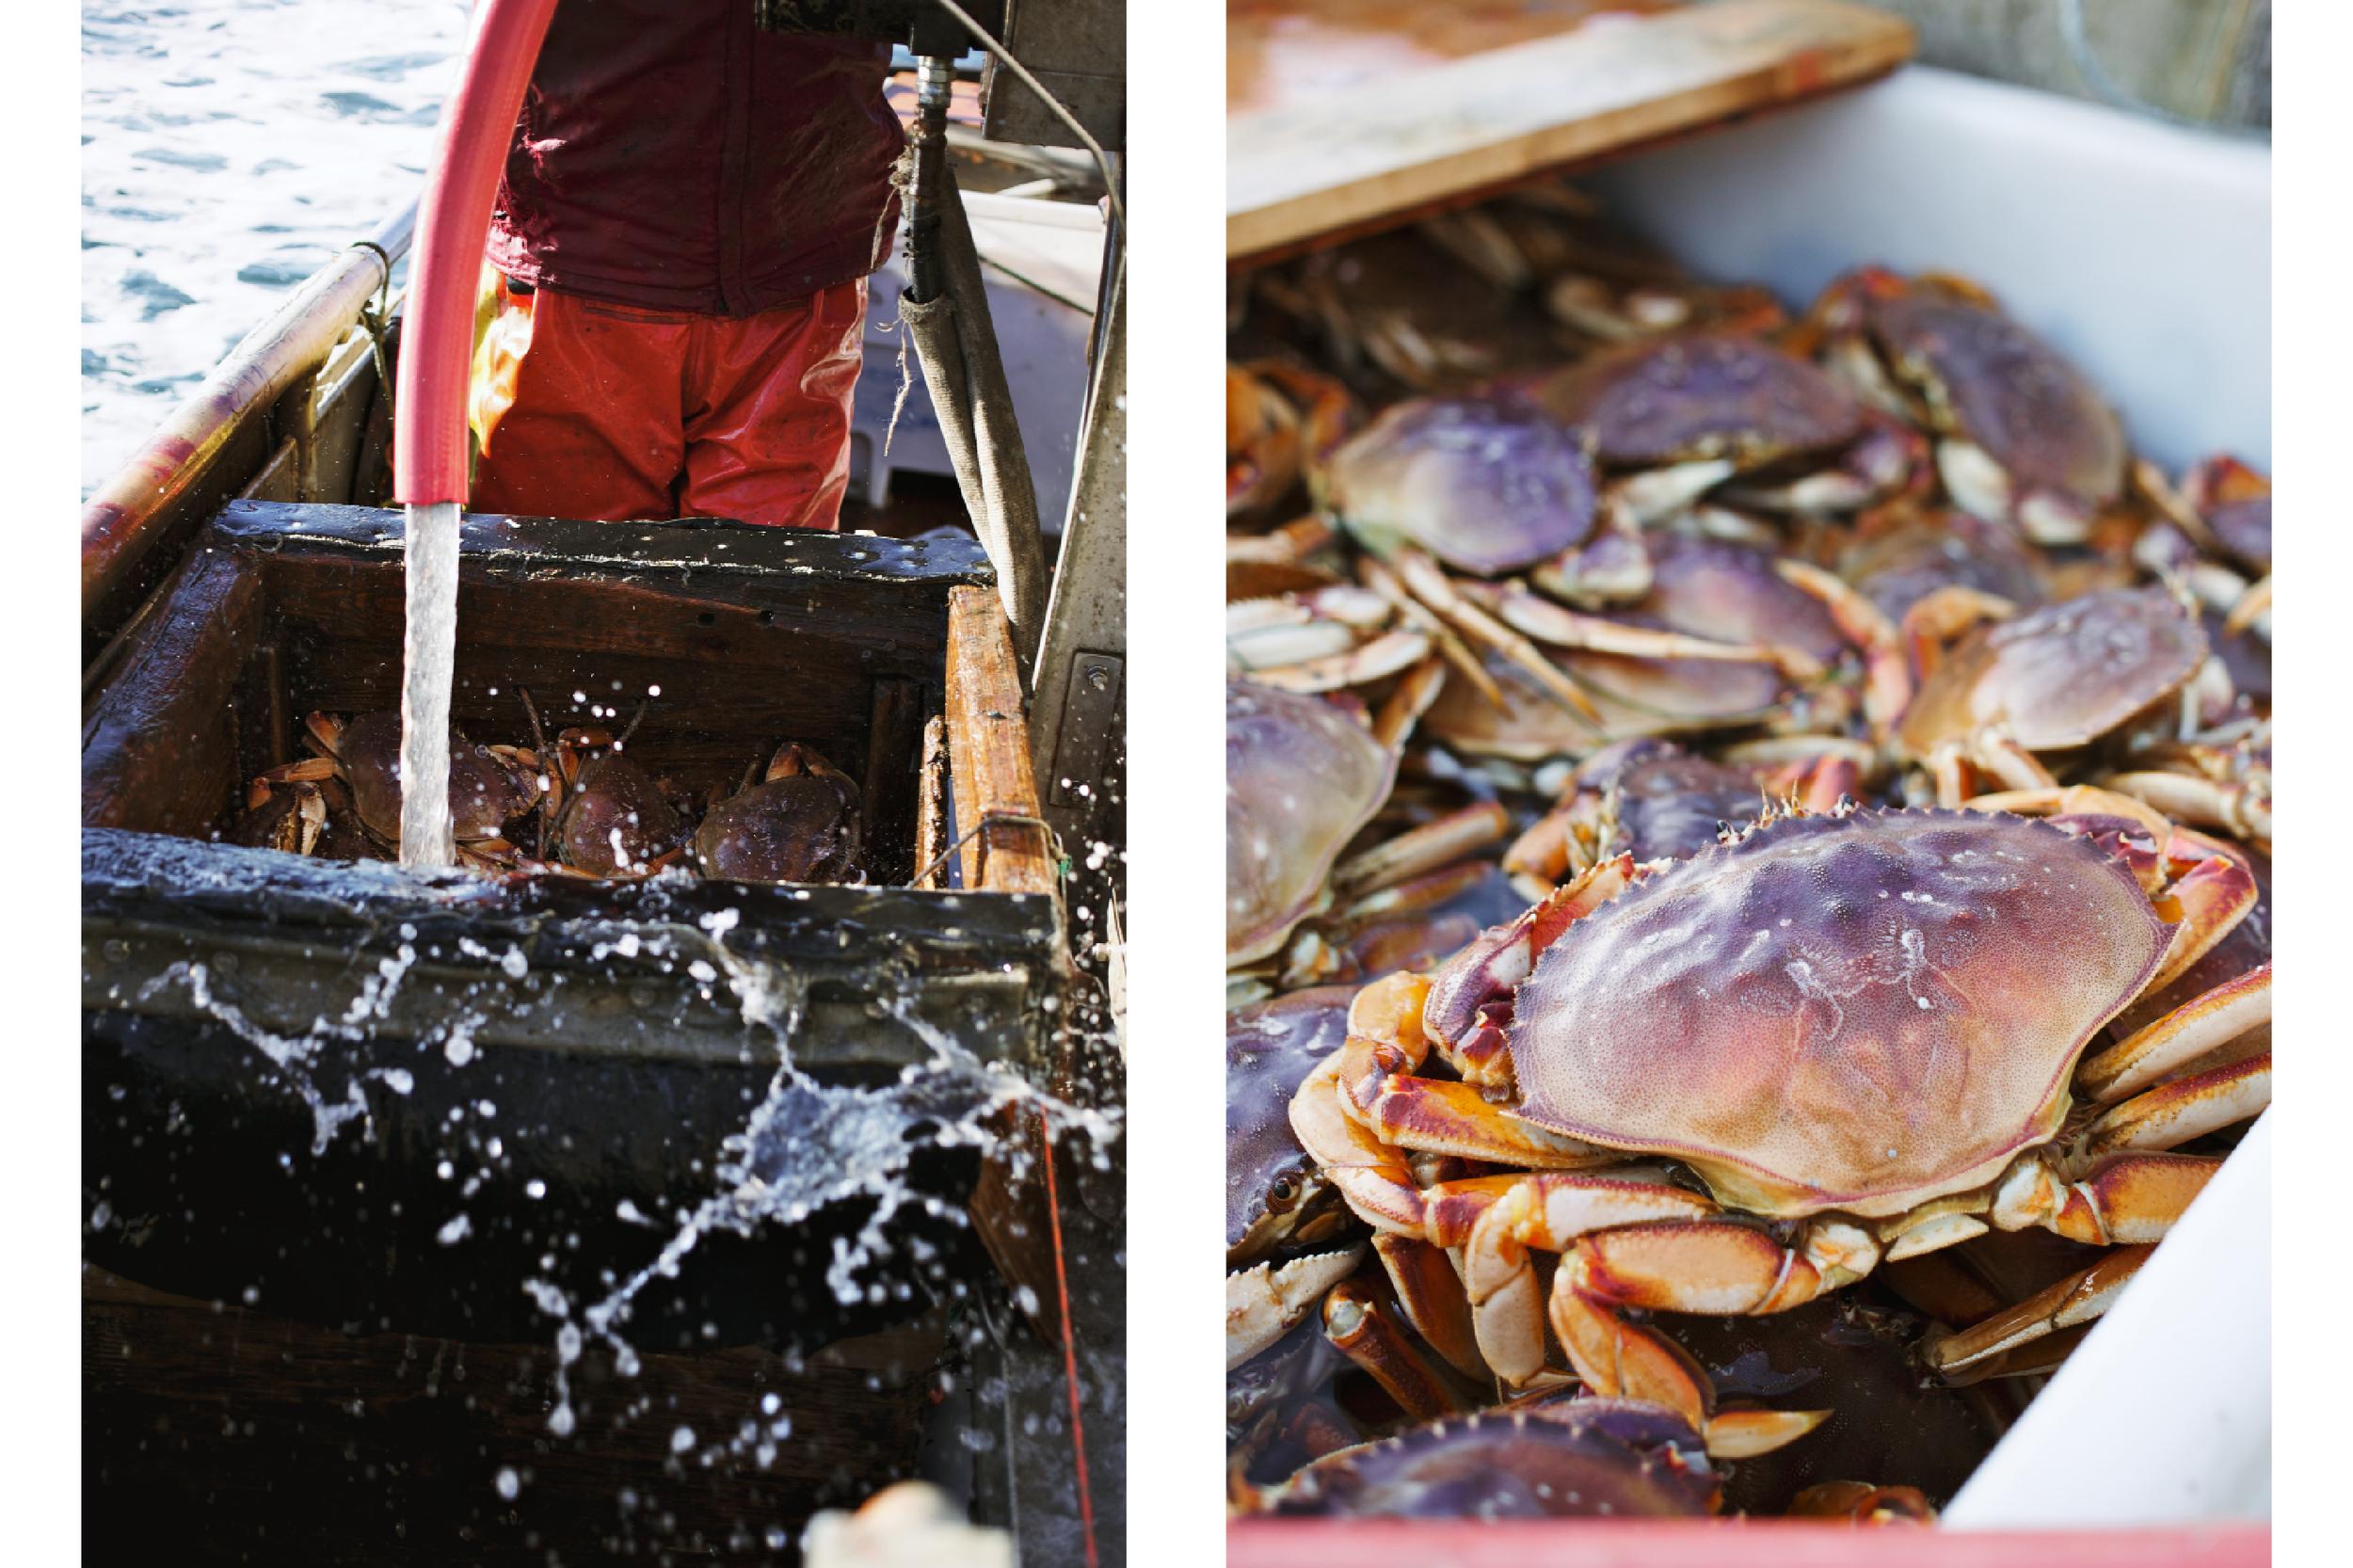 Crabbing12.jpg